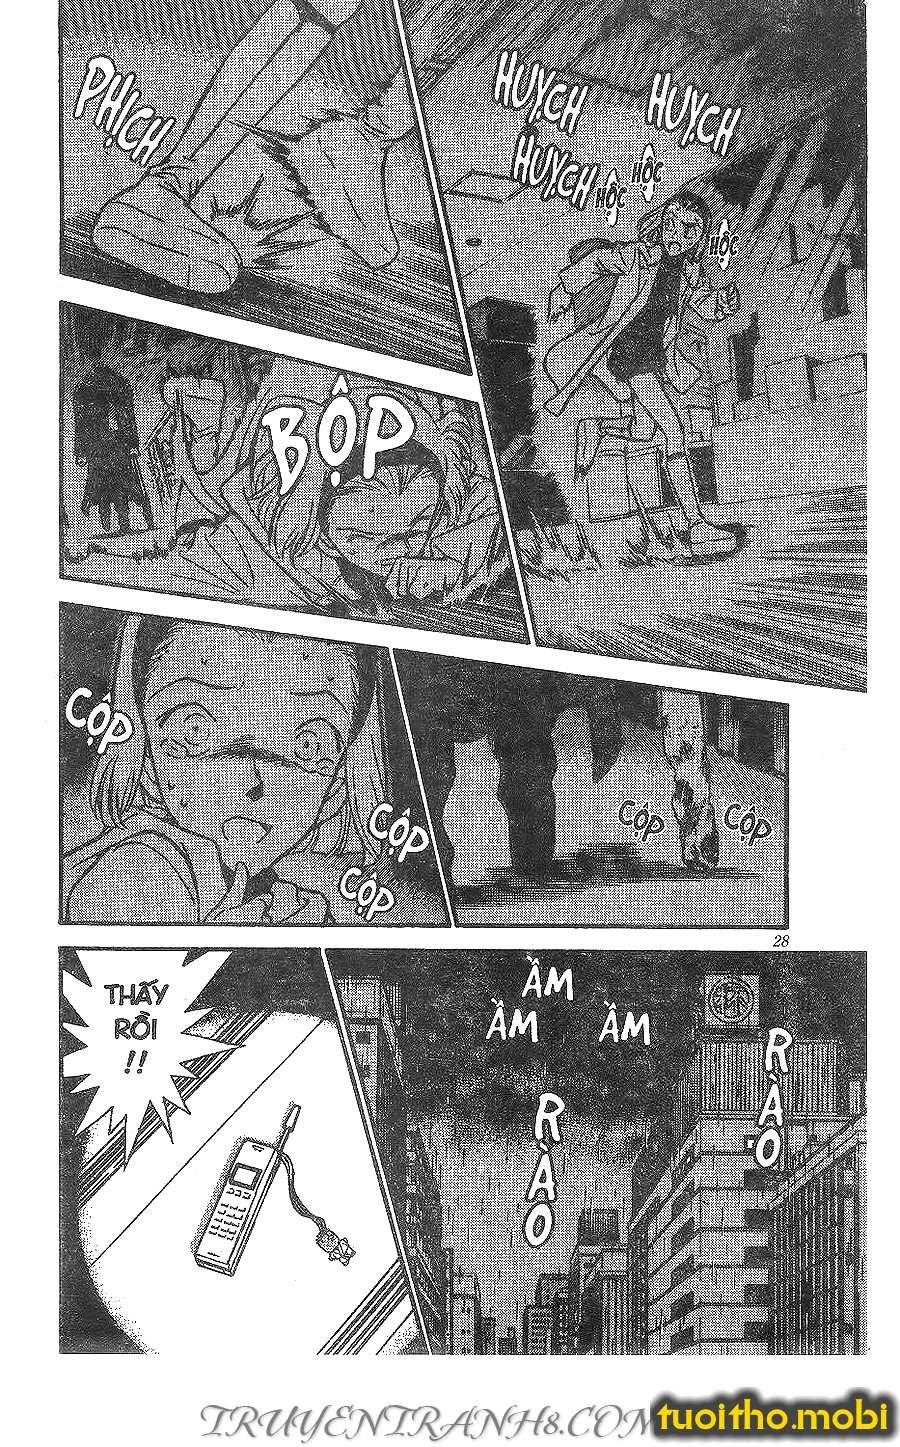 conan chương 286 trang 9